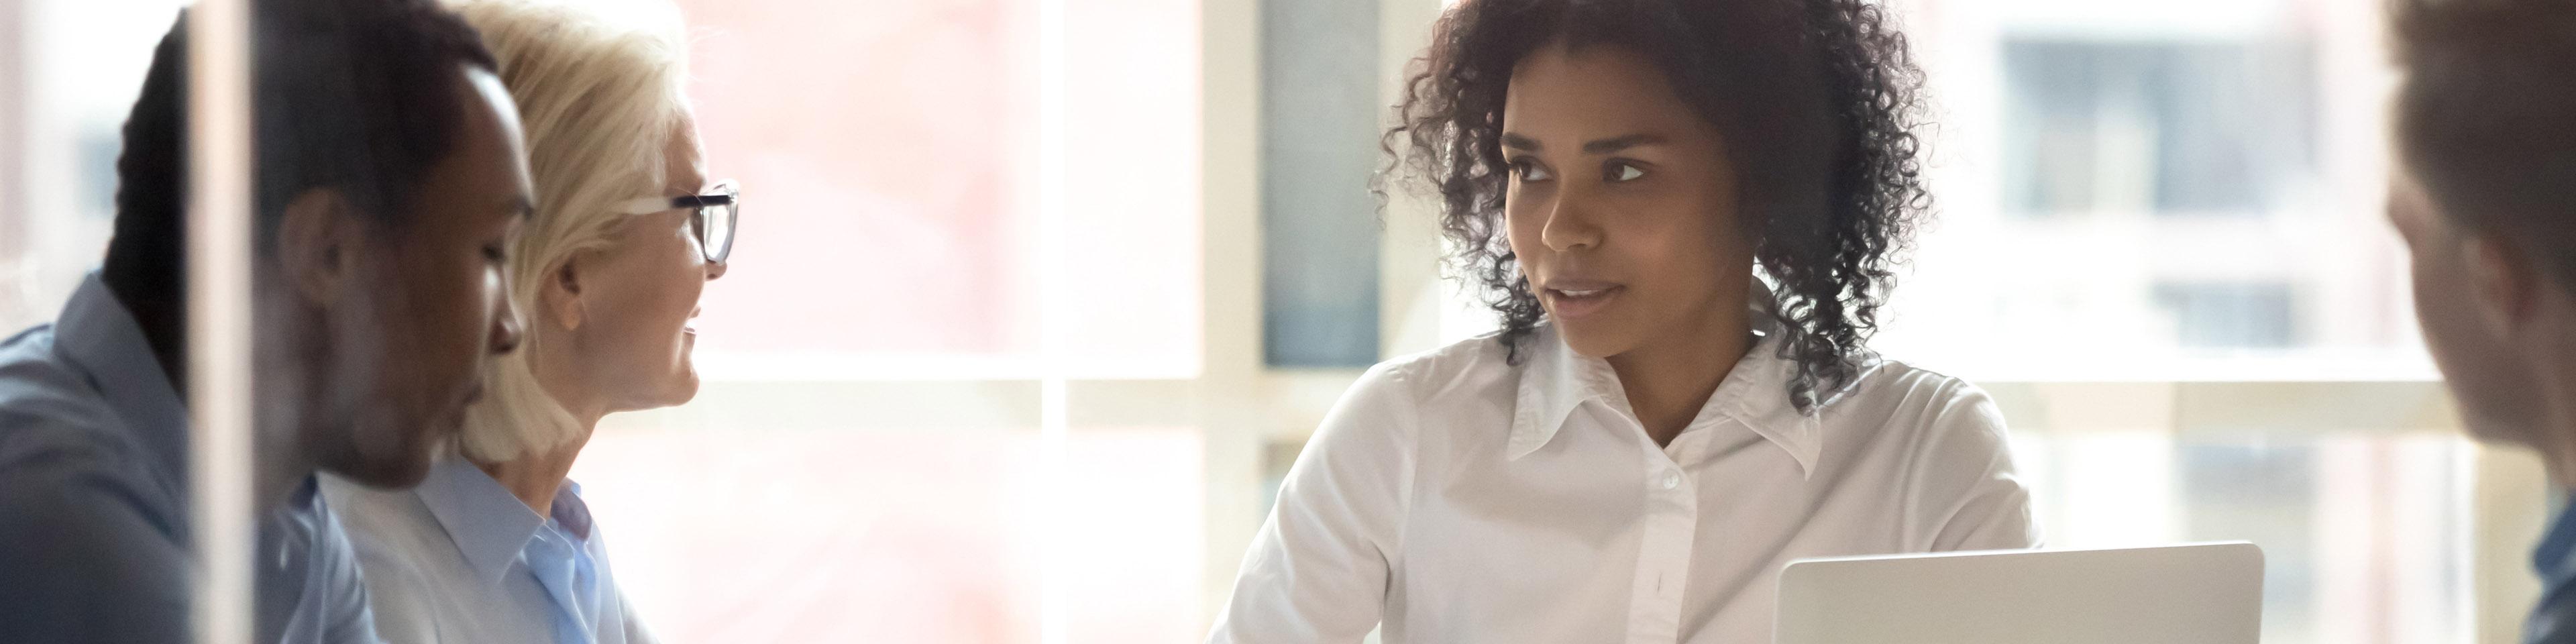 female business leader in boardroom